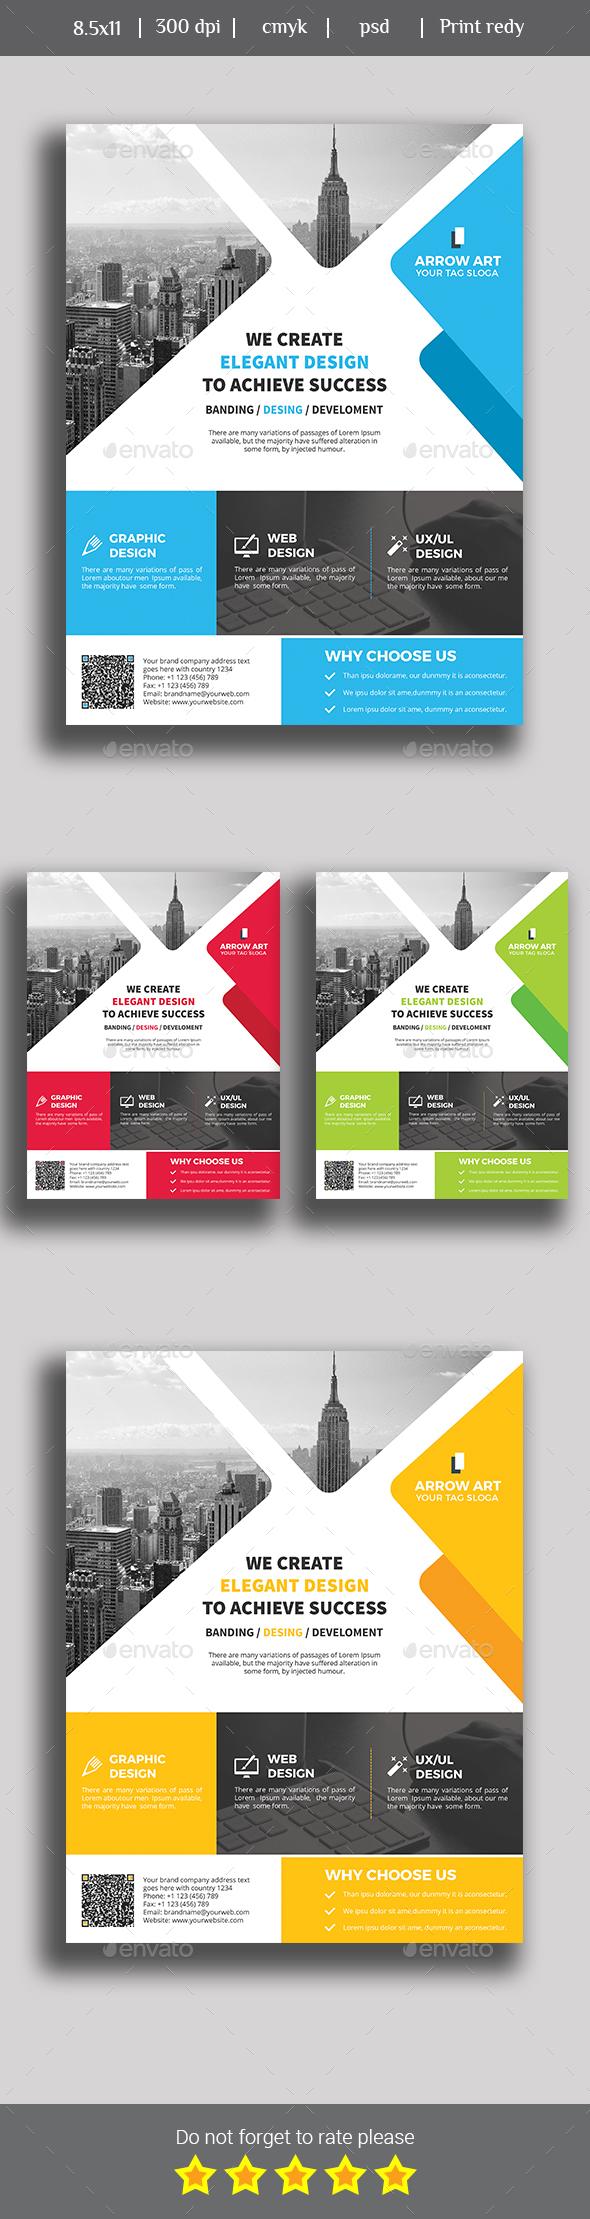 Corporate business flyer template psd flyer templates pinterest corporate business flyer template psd flashek Choice Image